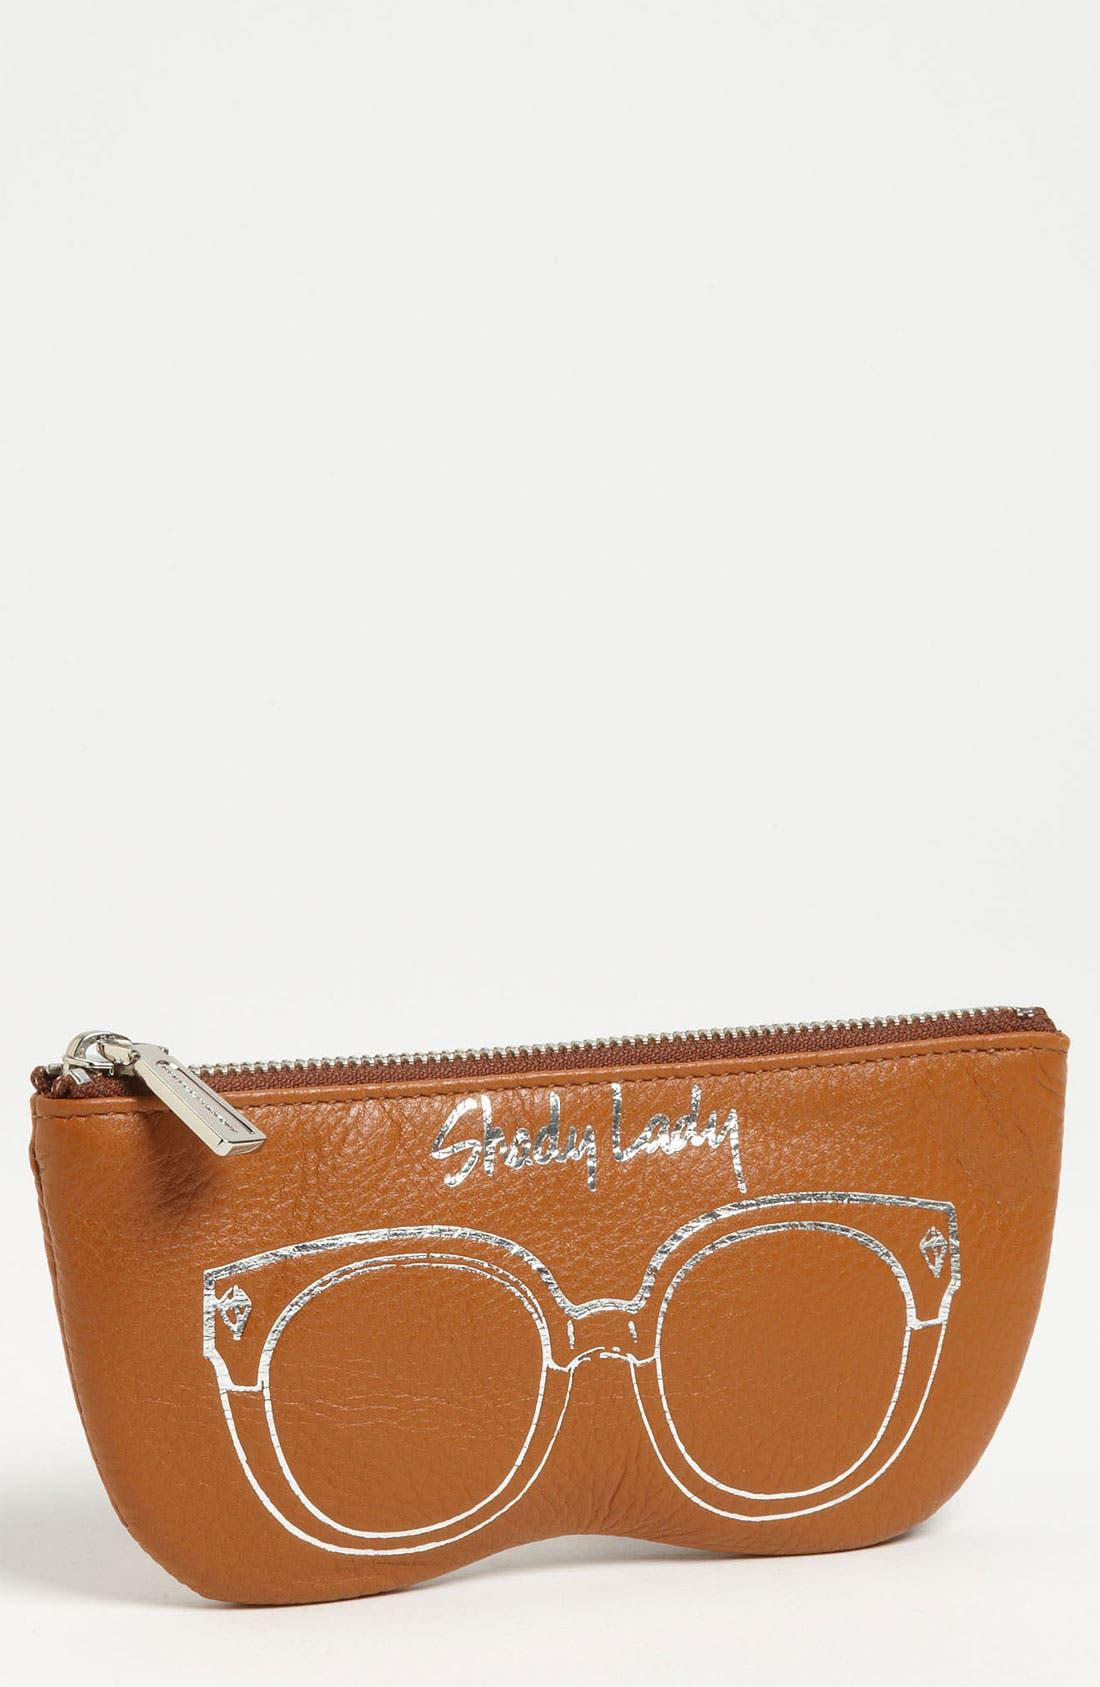 Main Image - Rebecca Minkoff 'Shady Lady' Leather Sunglasses Case